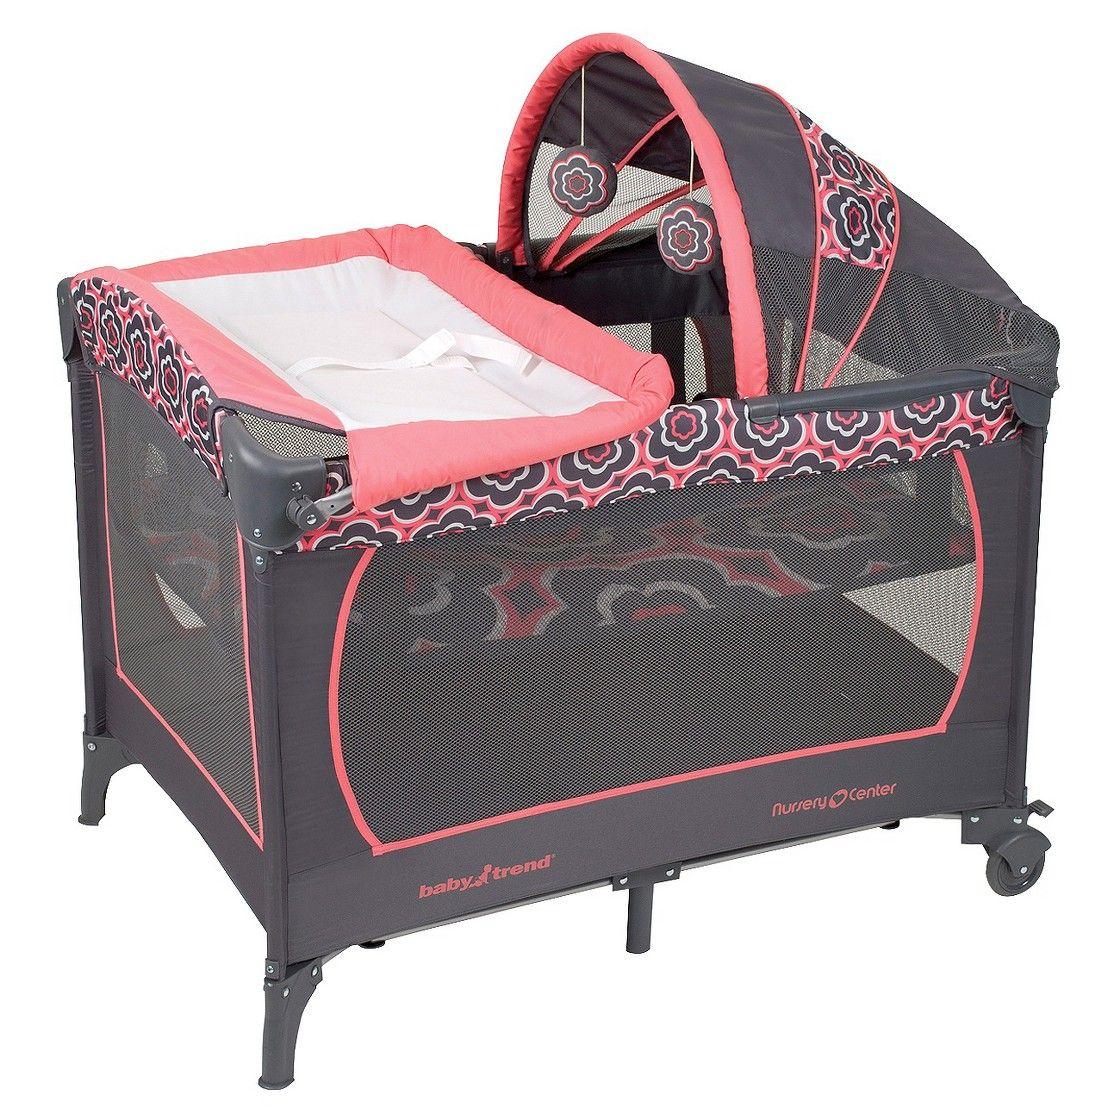 Baby Trend Serene Nursery Center Baby trend, Baby doll